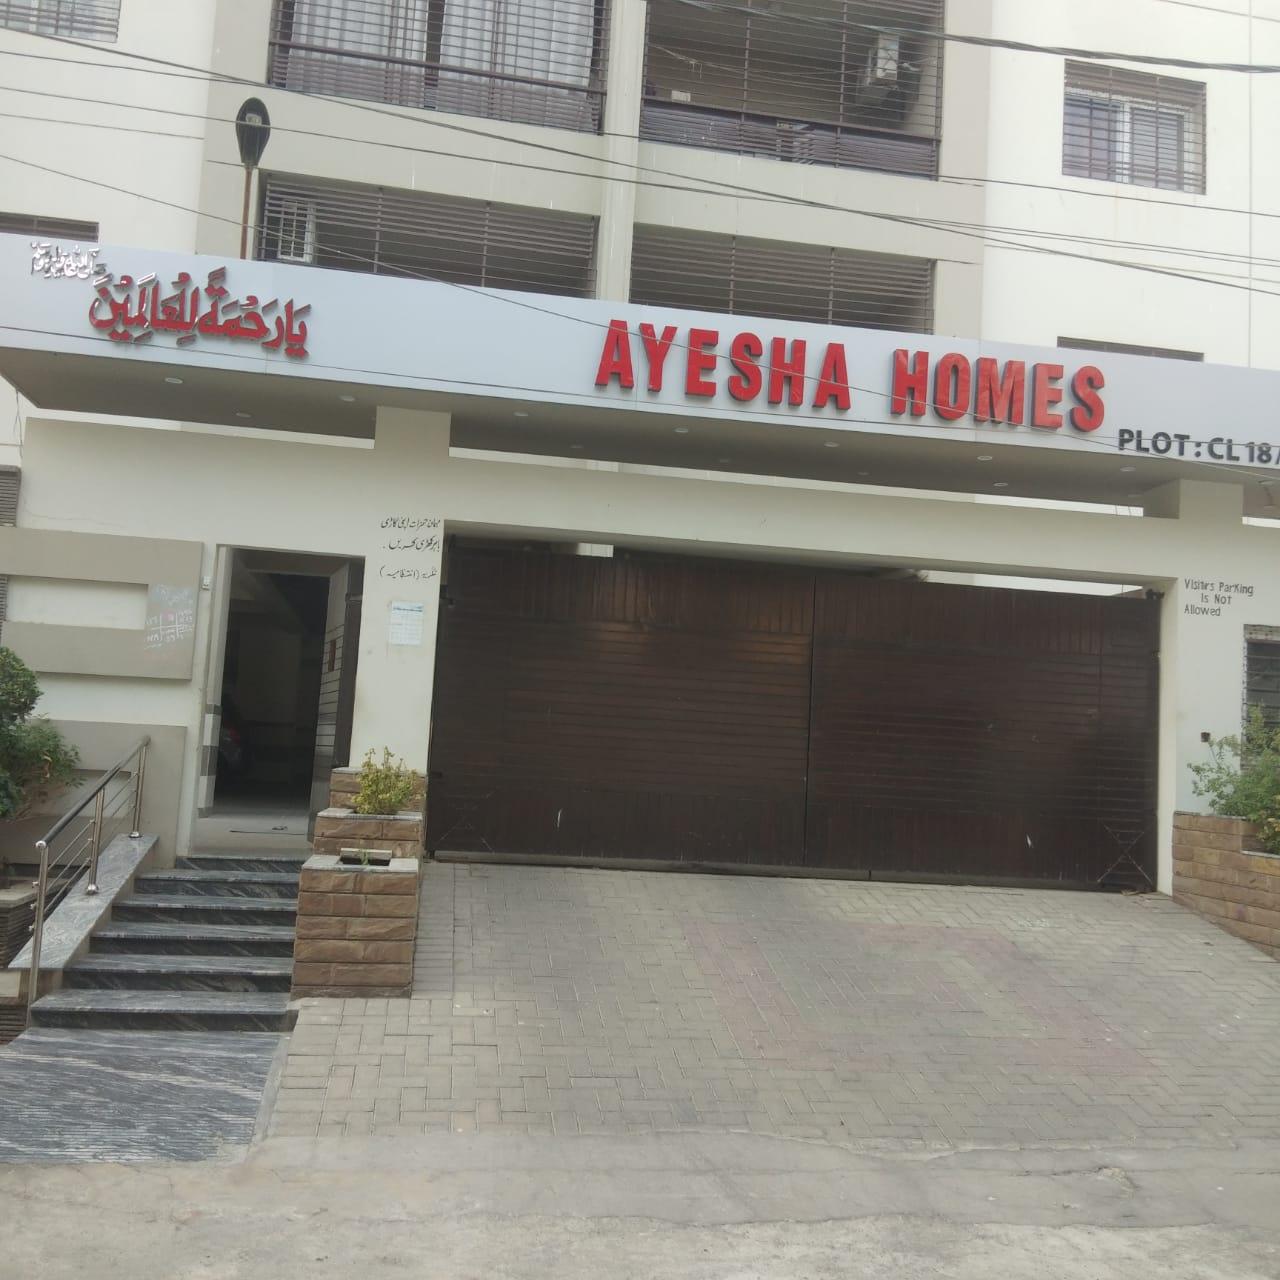 Ayesha Homes